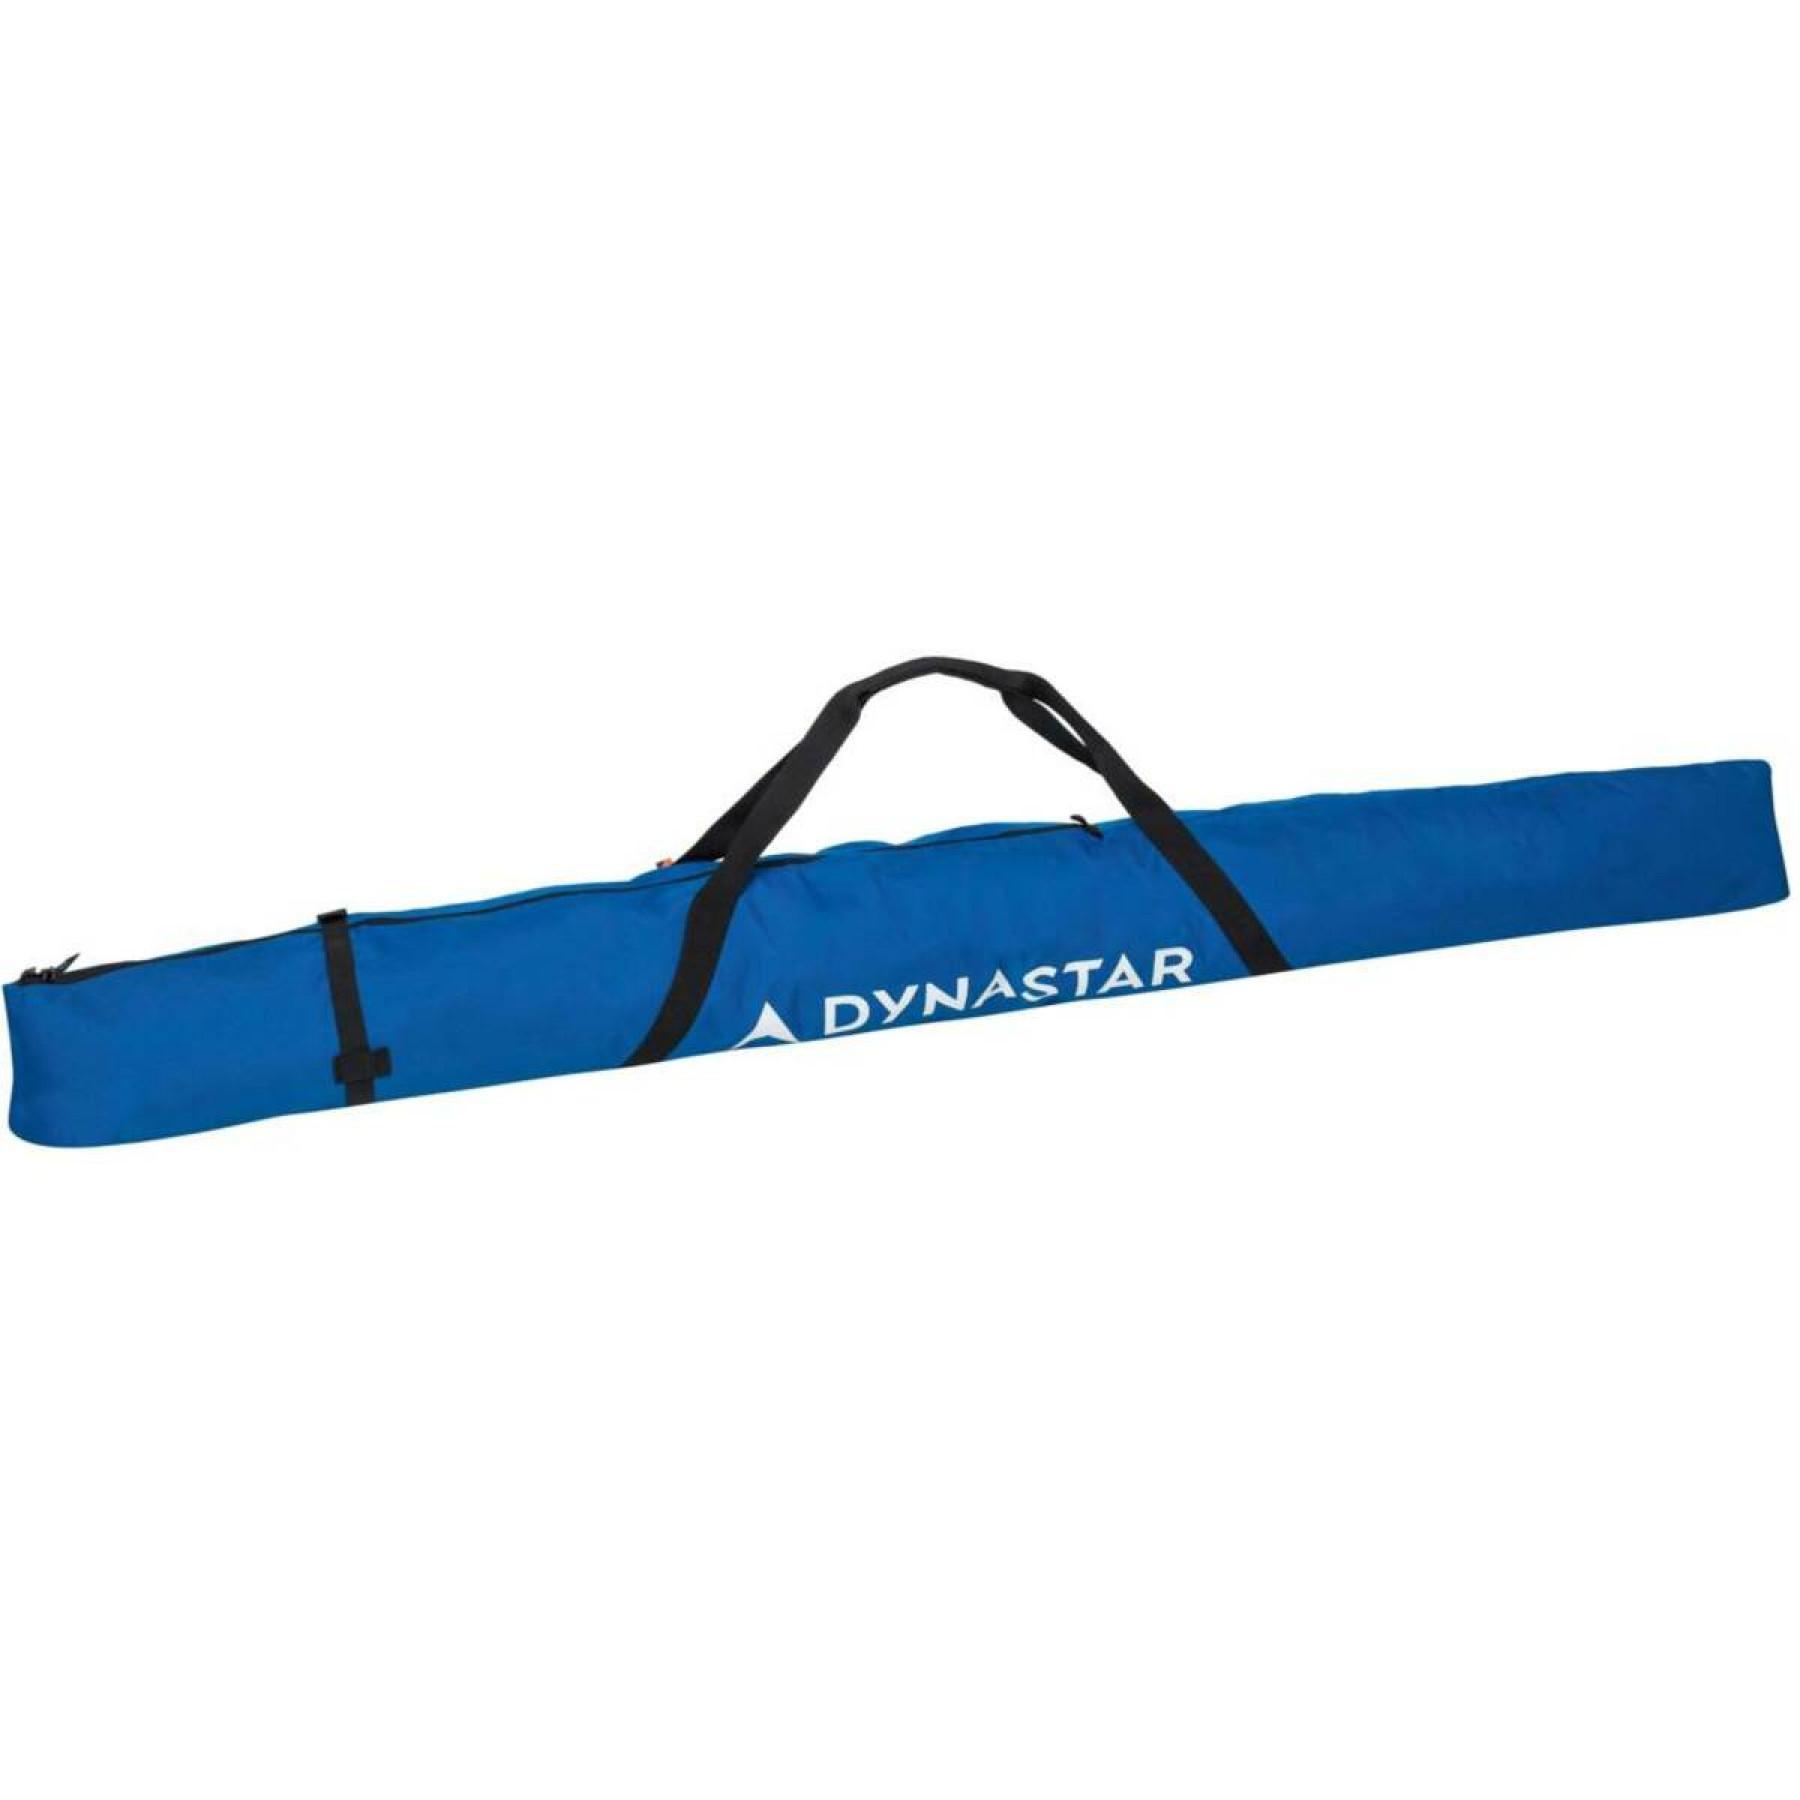 Ski bag Dynastar speedzone basic 185cm